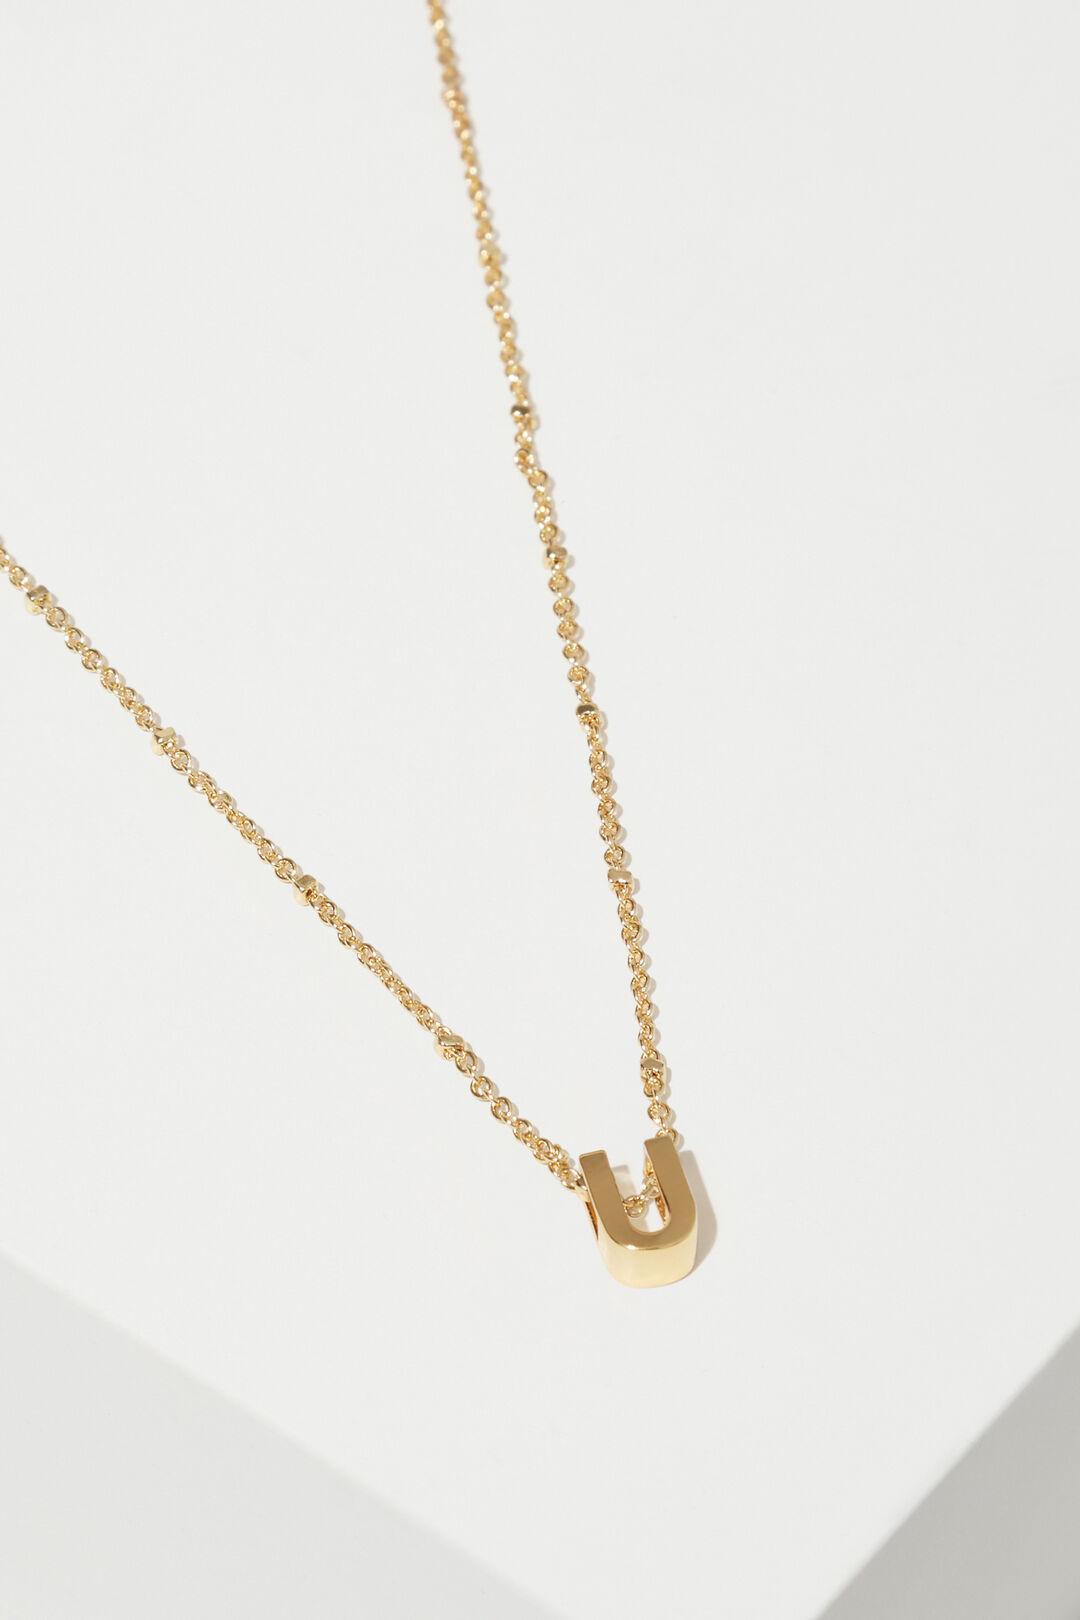 Gold Initial Charm  U  hi-res